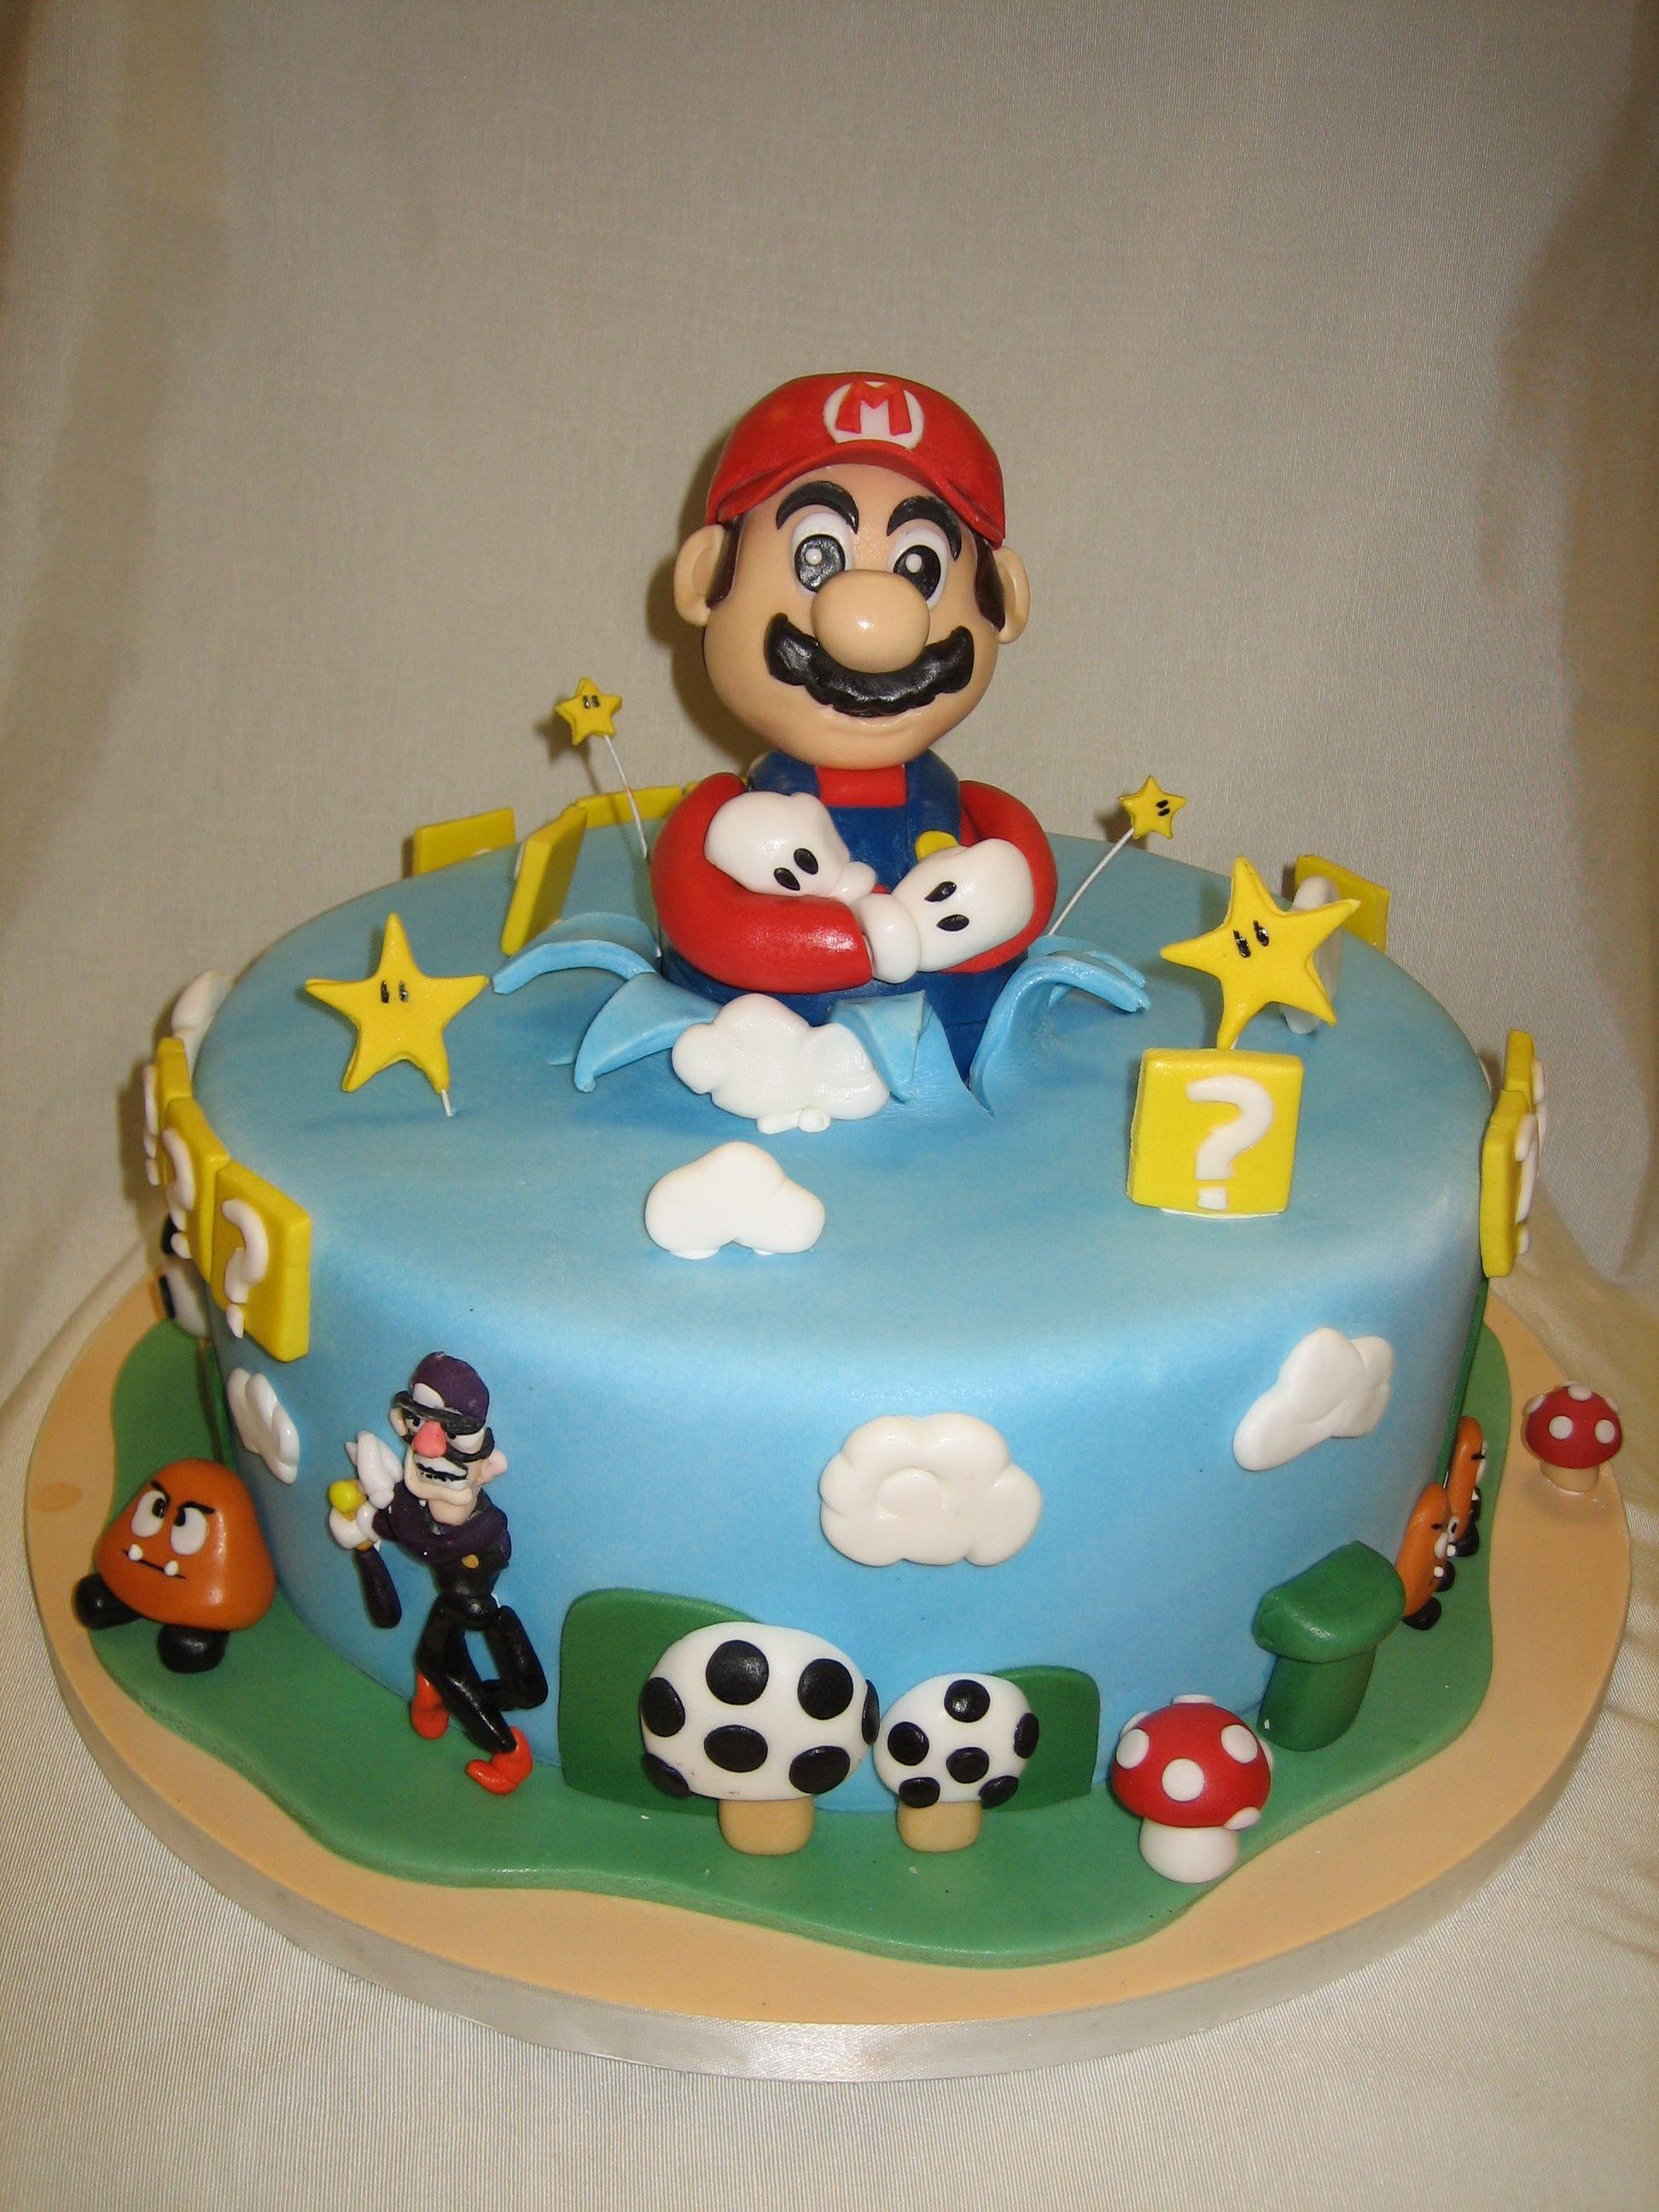 Amy Beck Cake Design - Chicago, IL - Super Mario birthday cake ...